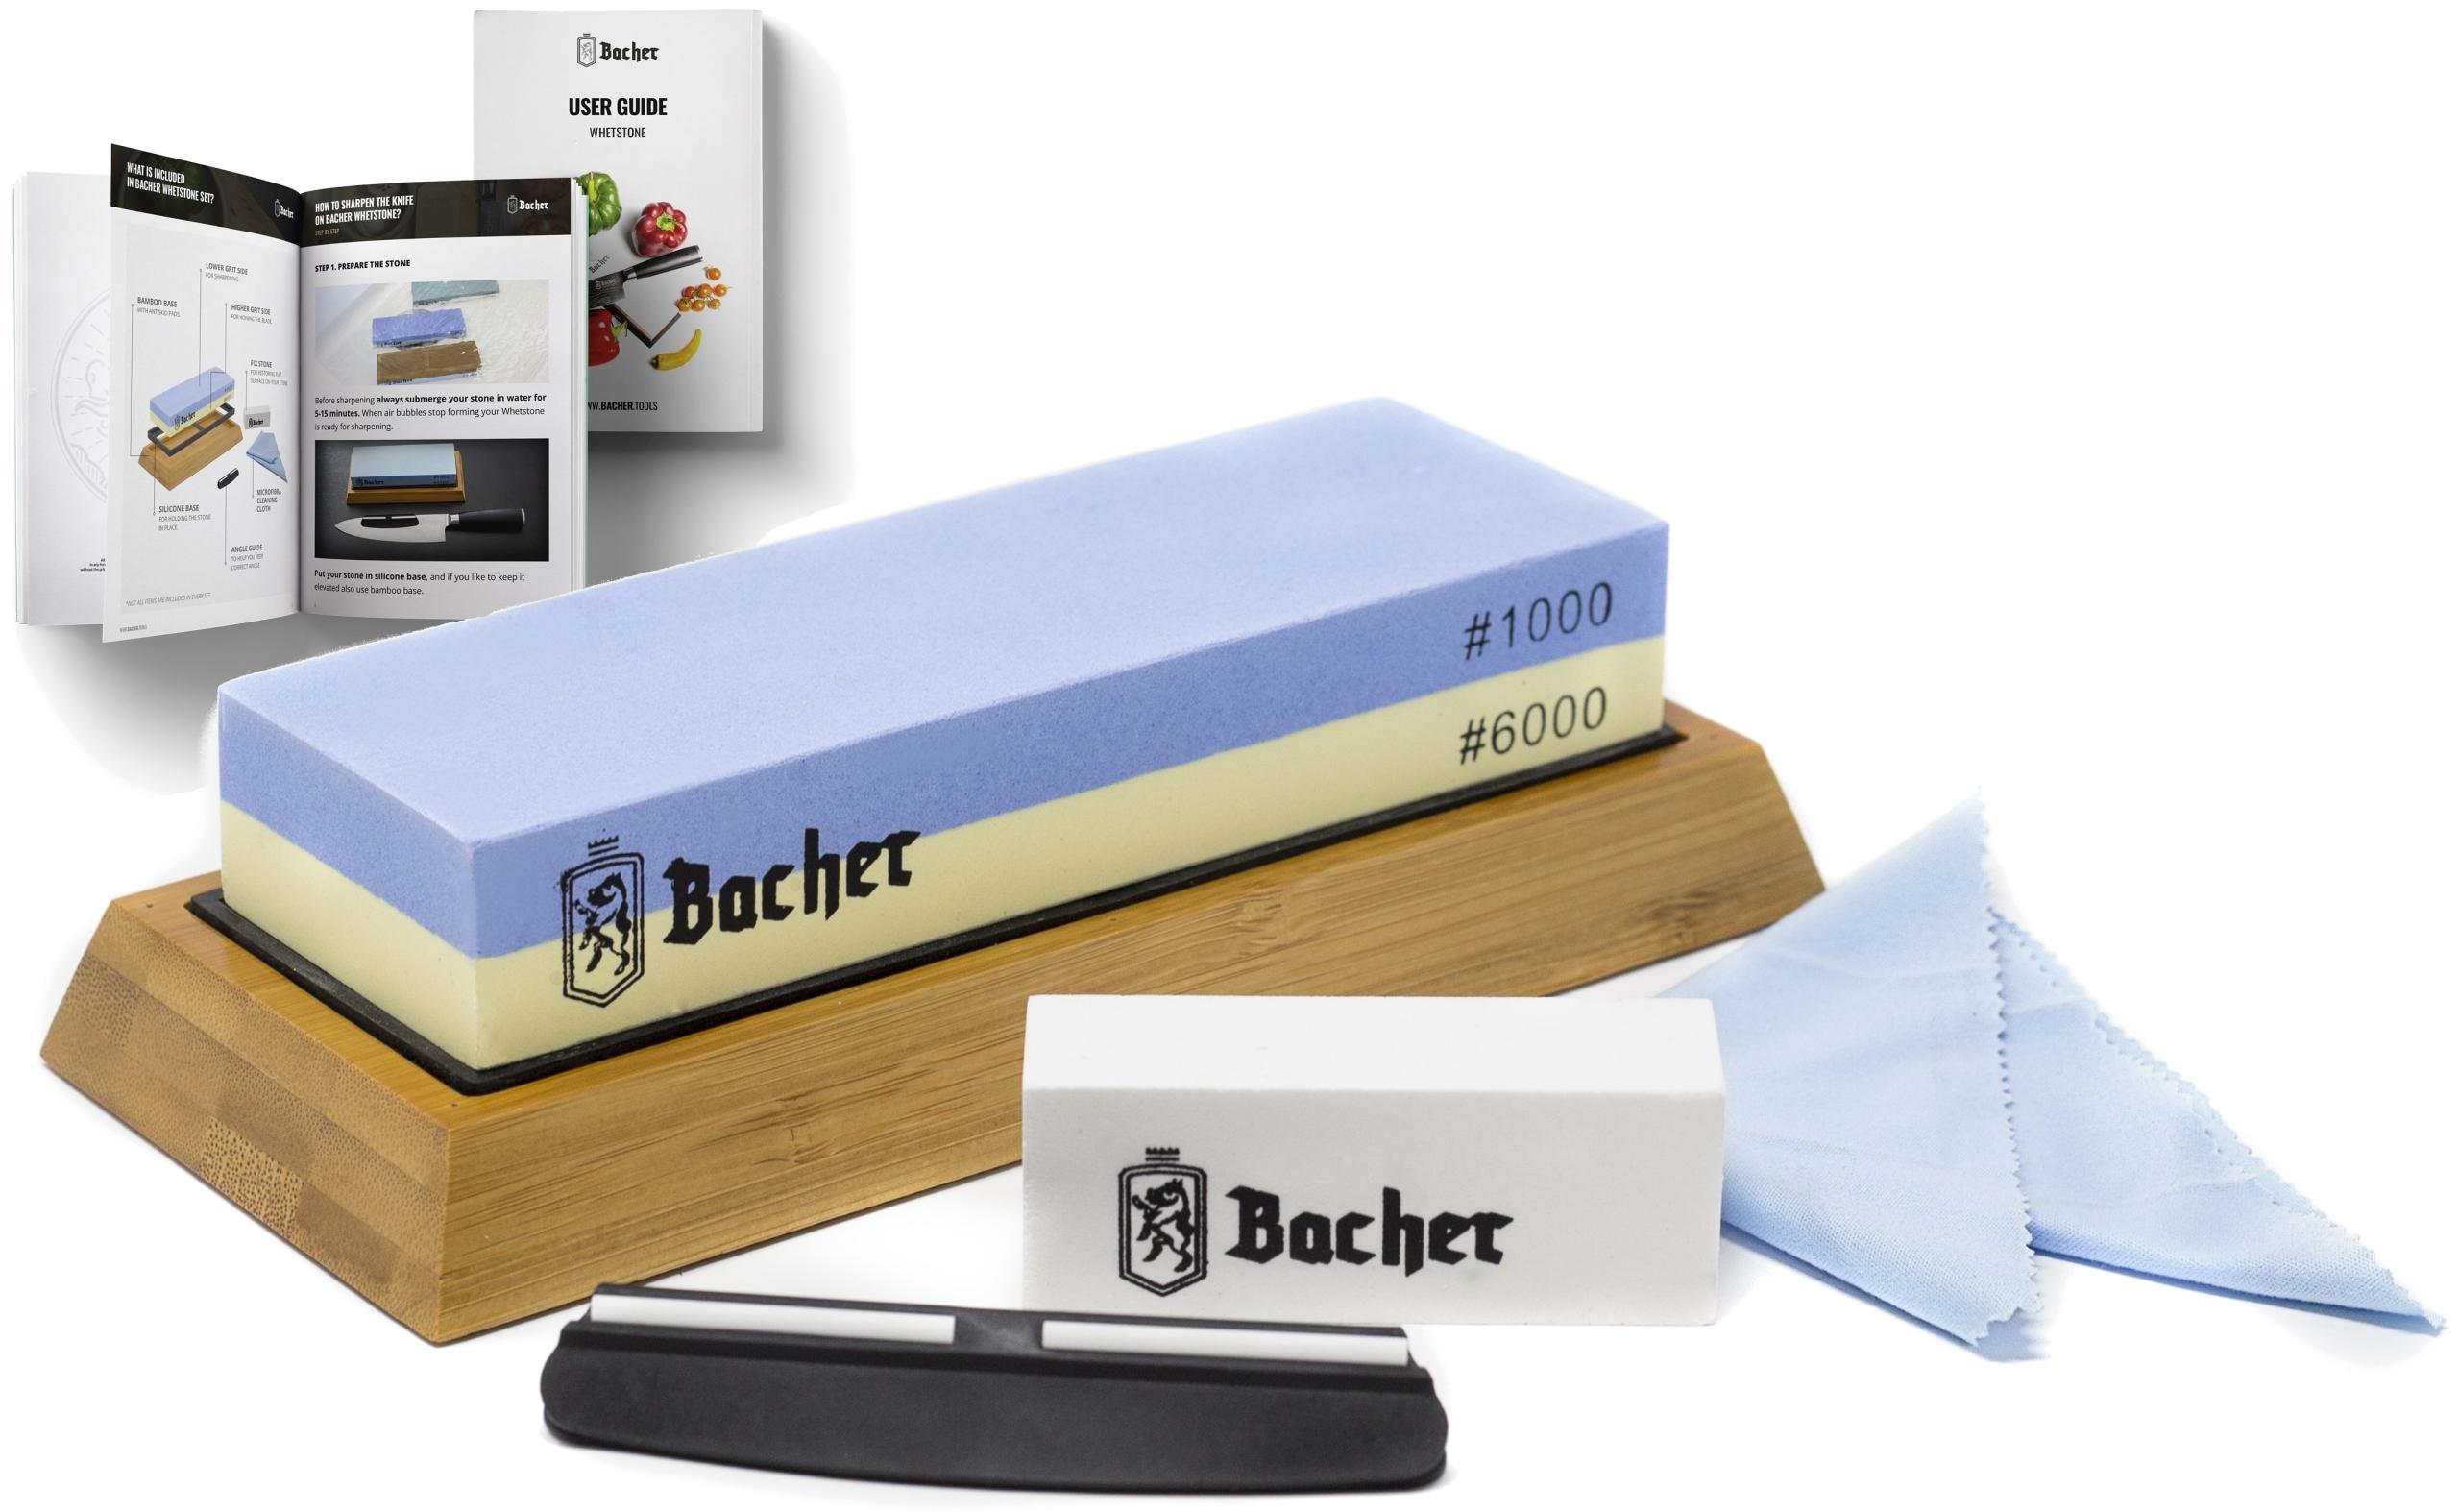 Stroj BACHER osełka kameň 1000/6000 SET+ebook